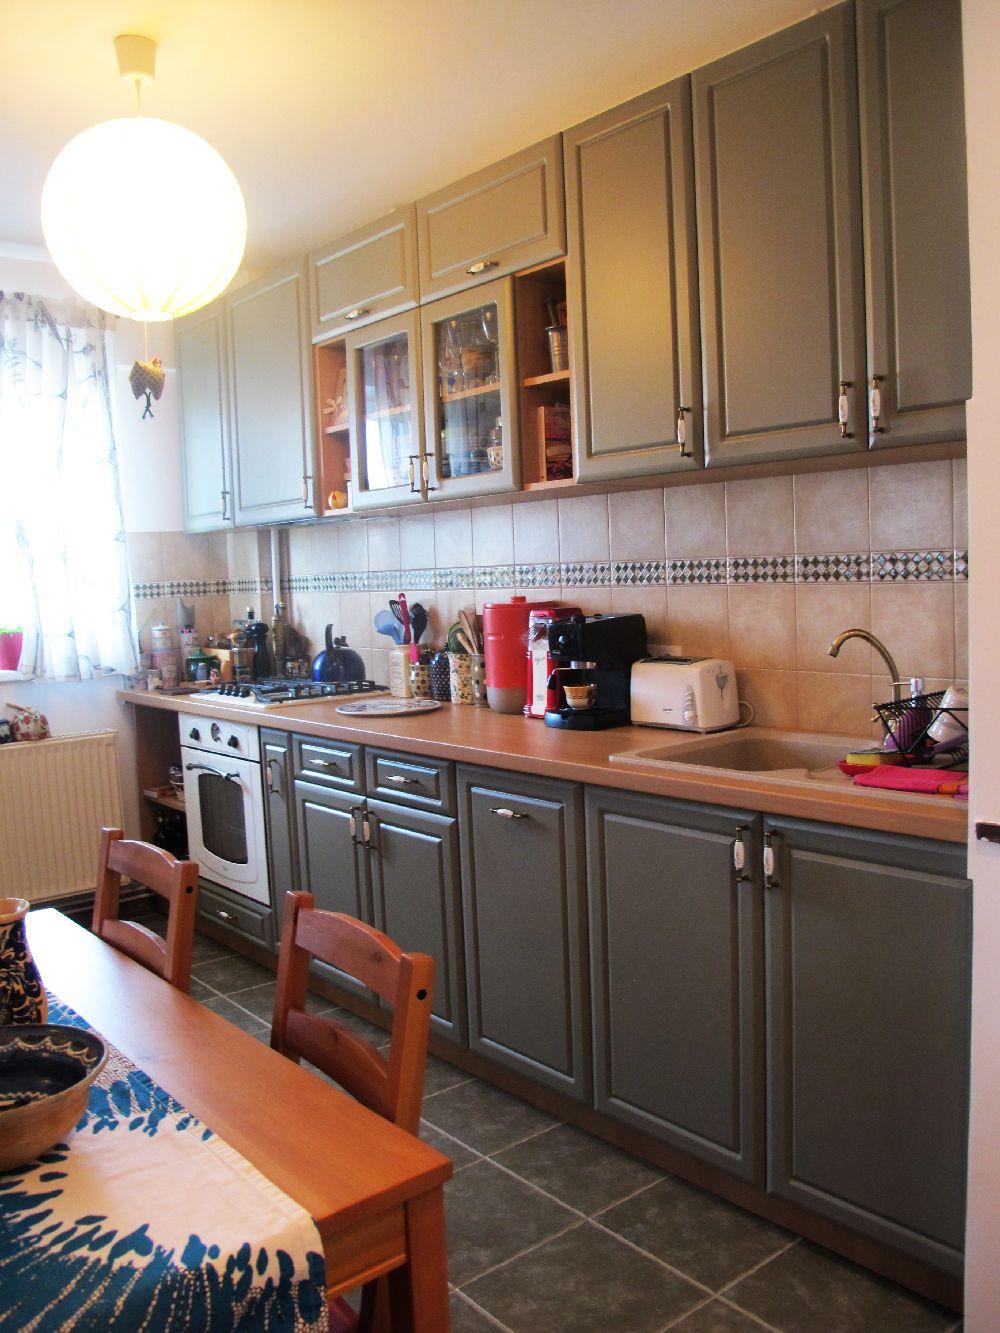 adelaparvu.com despre apartament 3 camere colorat in Sibiu, Foto Adela Parvu (66)